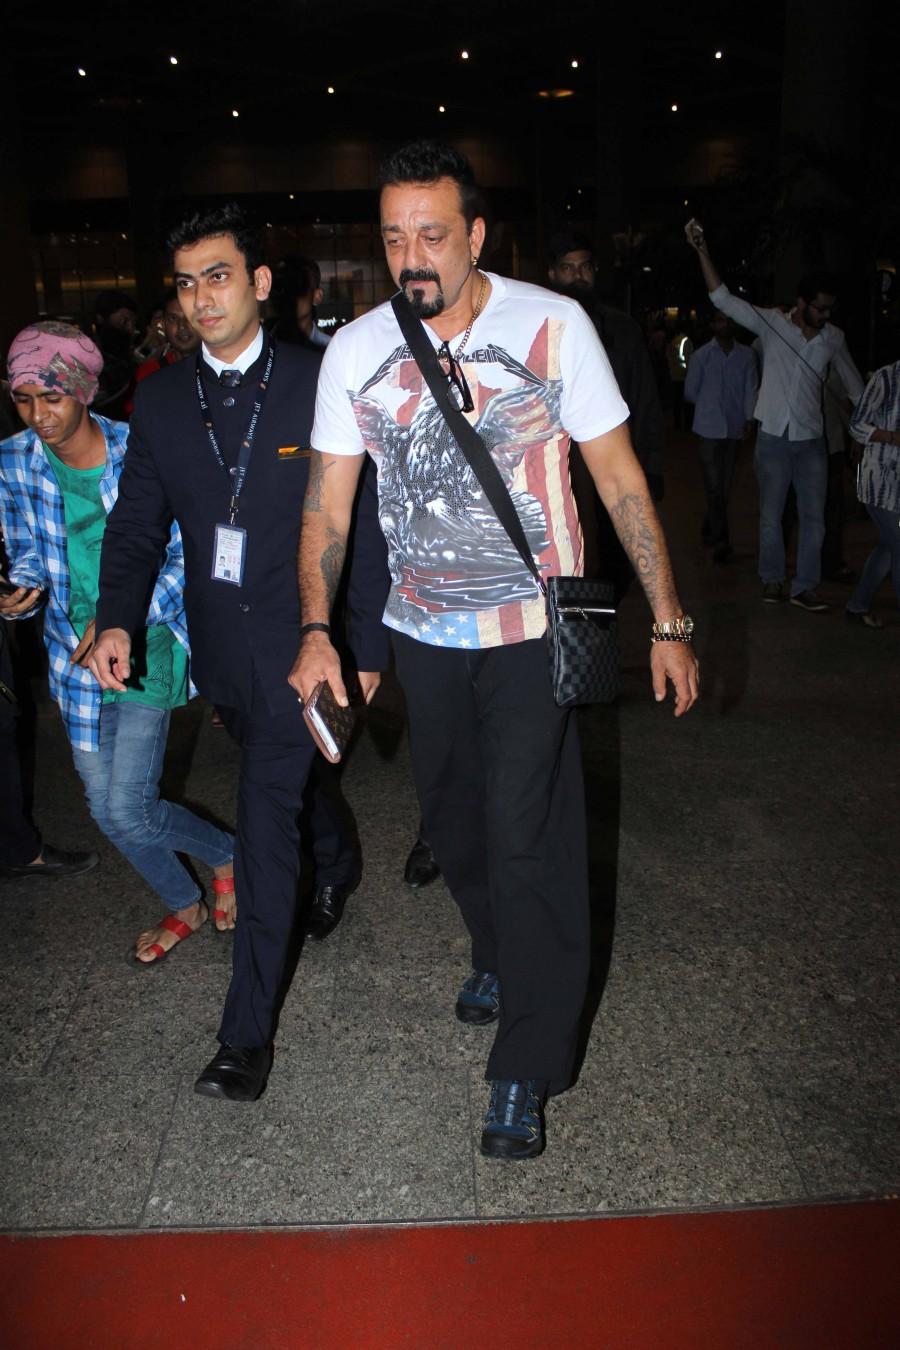 Shradha Kapoor,Katrina Kaif,Sanjay Dutt,Shradha Kapoor spotted at mumbai airport,Katrina Kaif spotted at mumbai airport,Sanjay Dutt spotted at mumbai airport,Celebs at airport